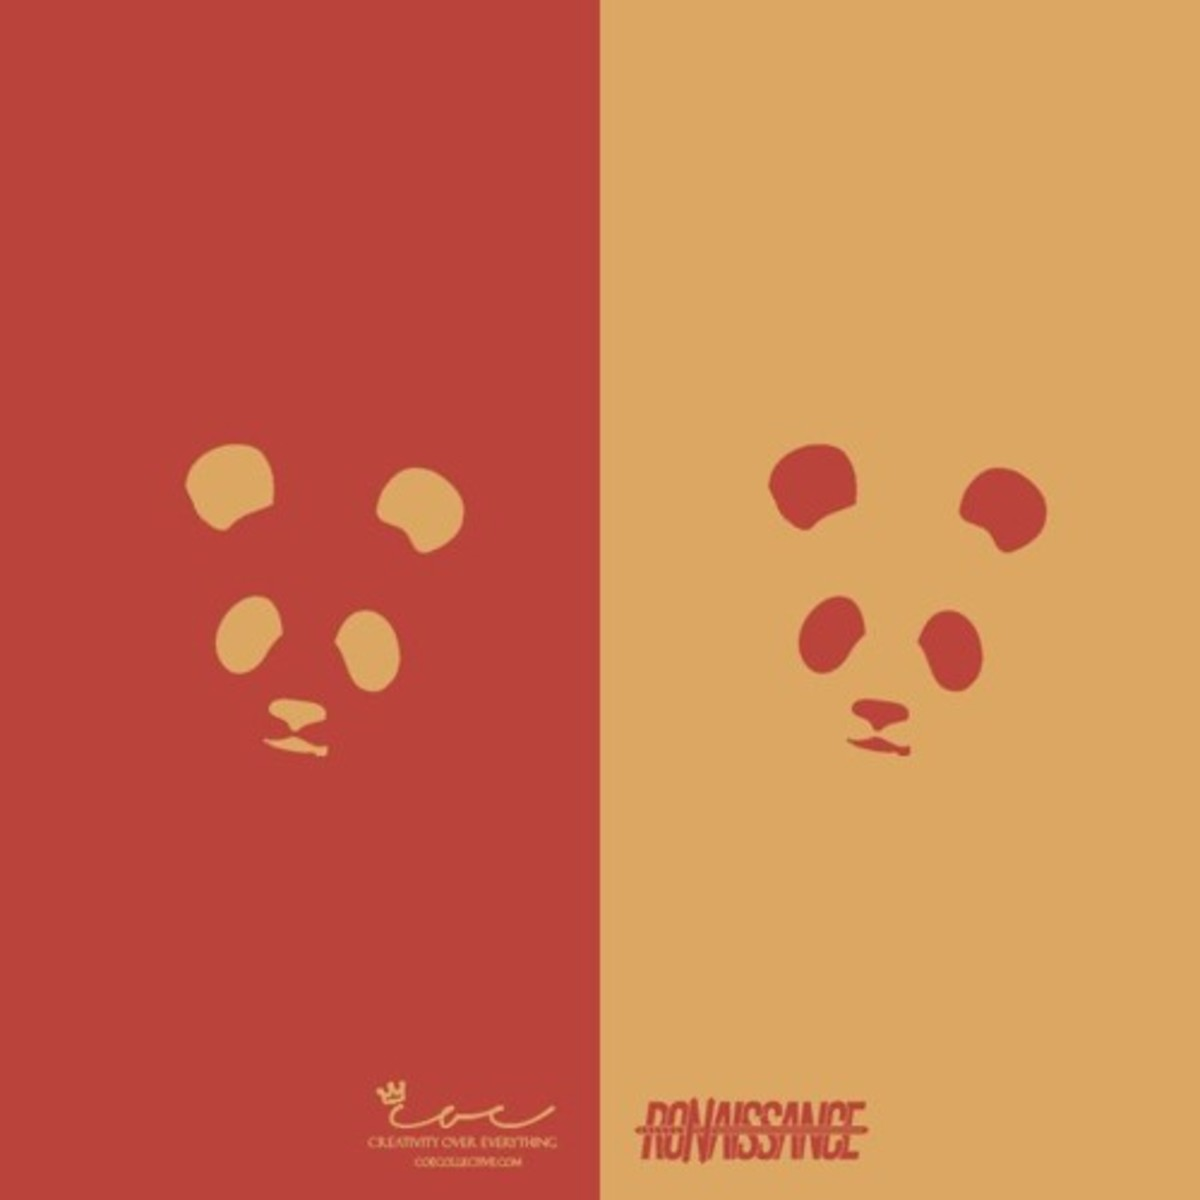 desiigner-panda-pt-2-ronaissance-remix.jpg